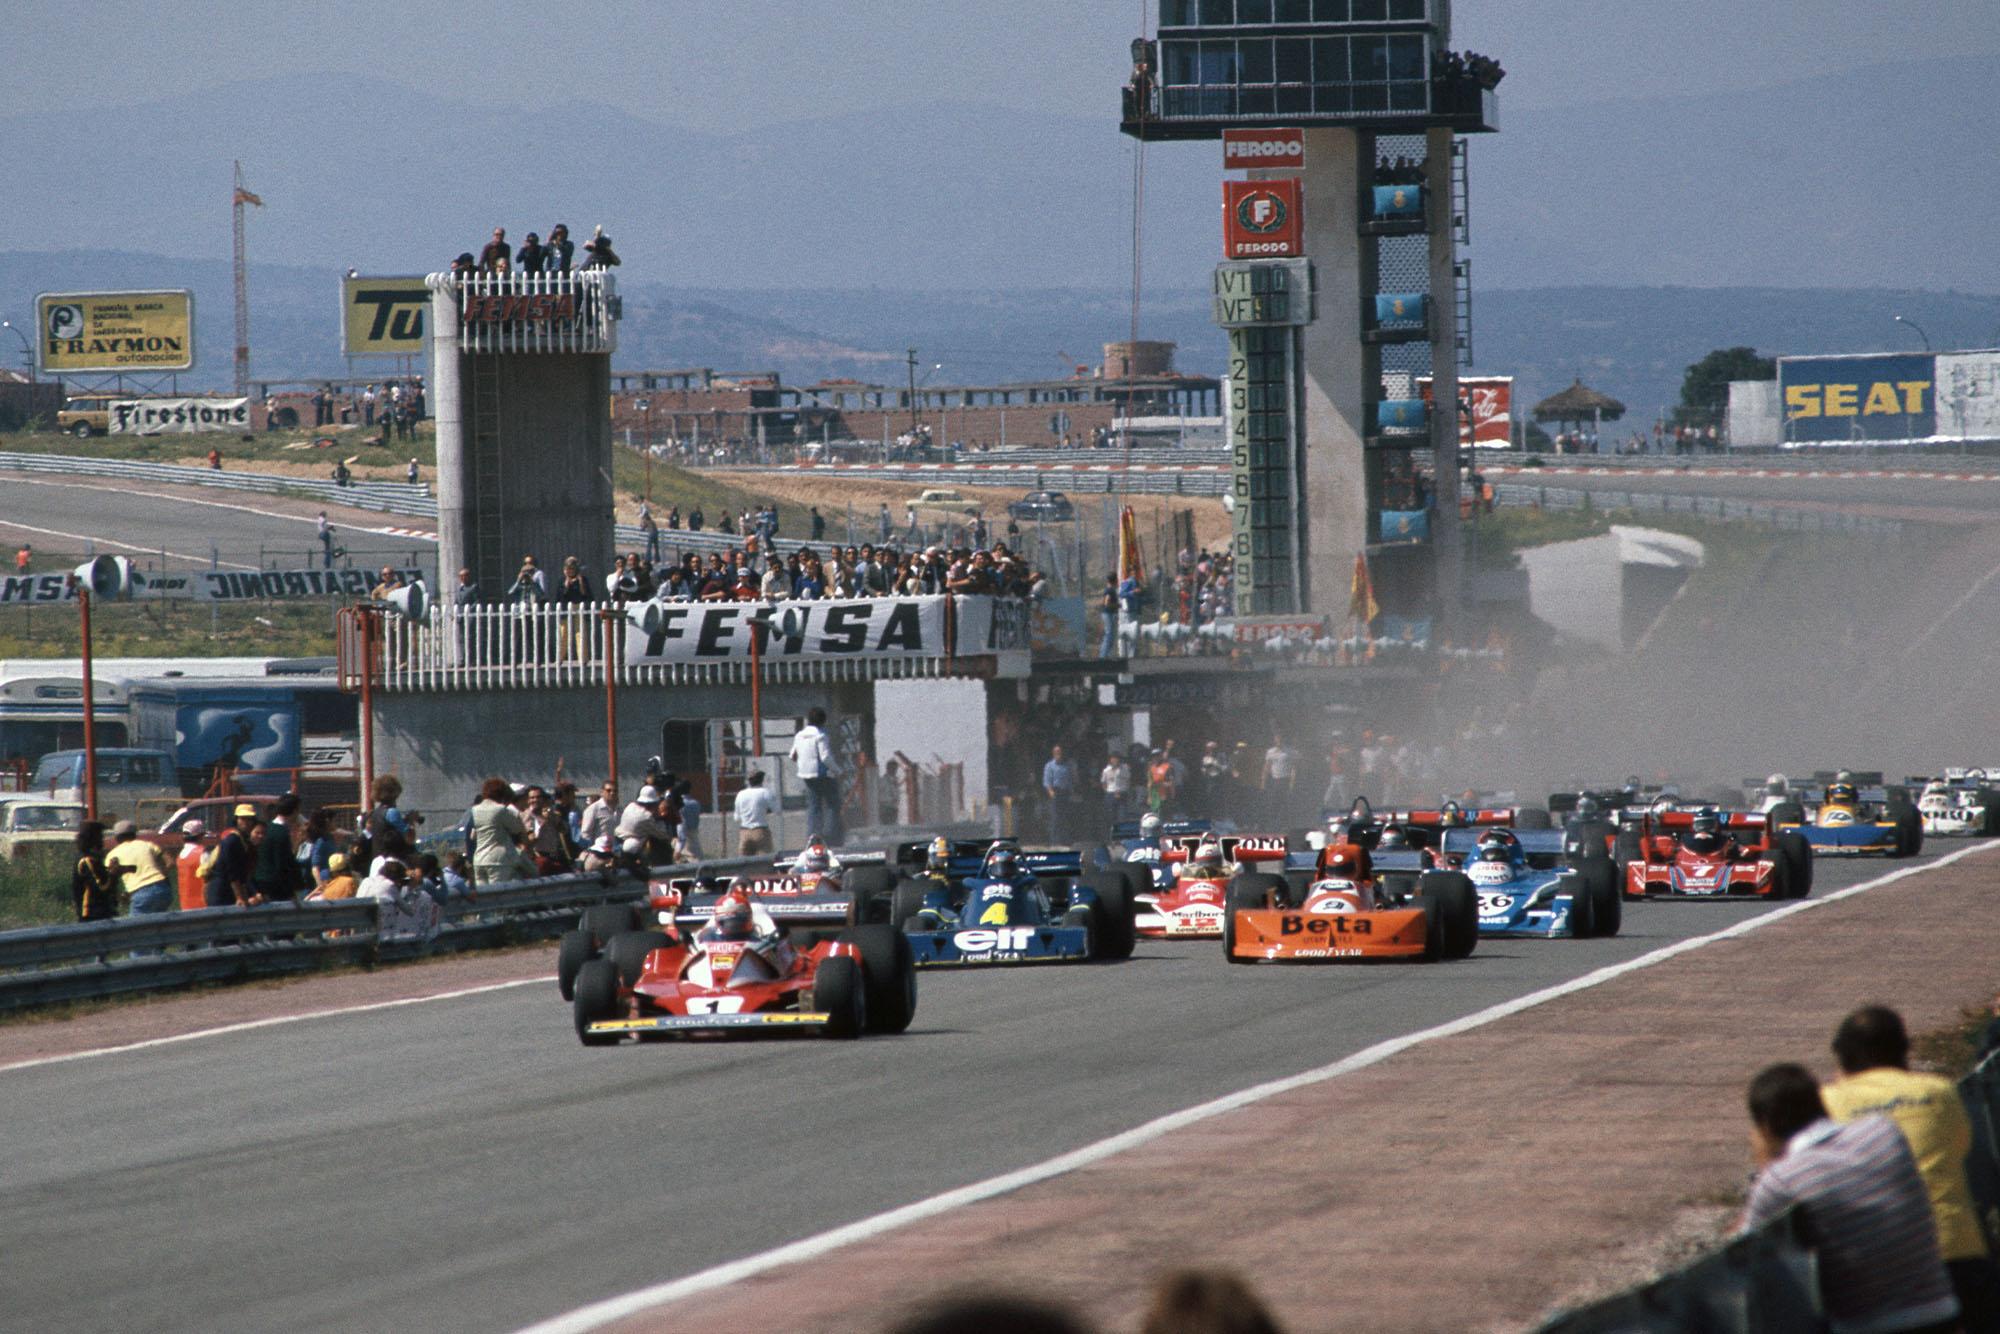 The 1976 Spanish Grand Prix gets underway.